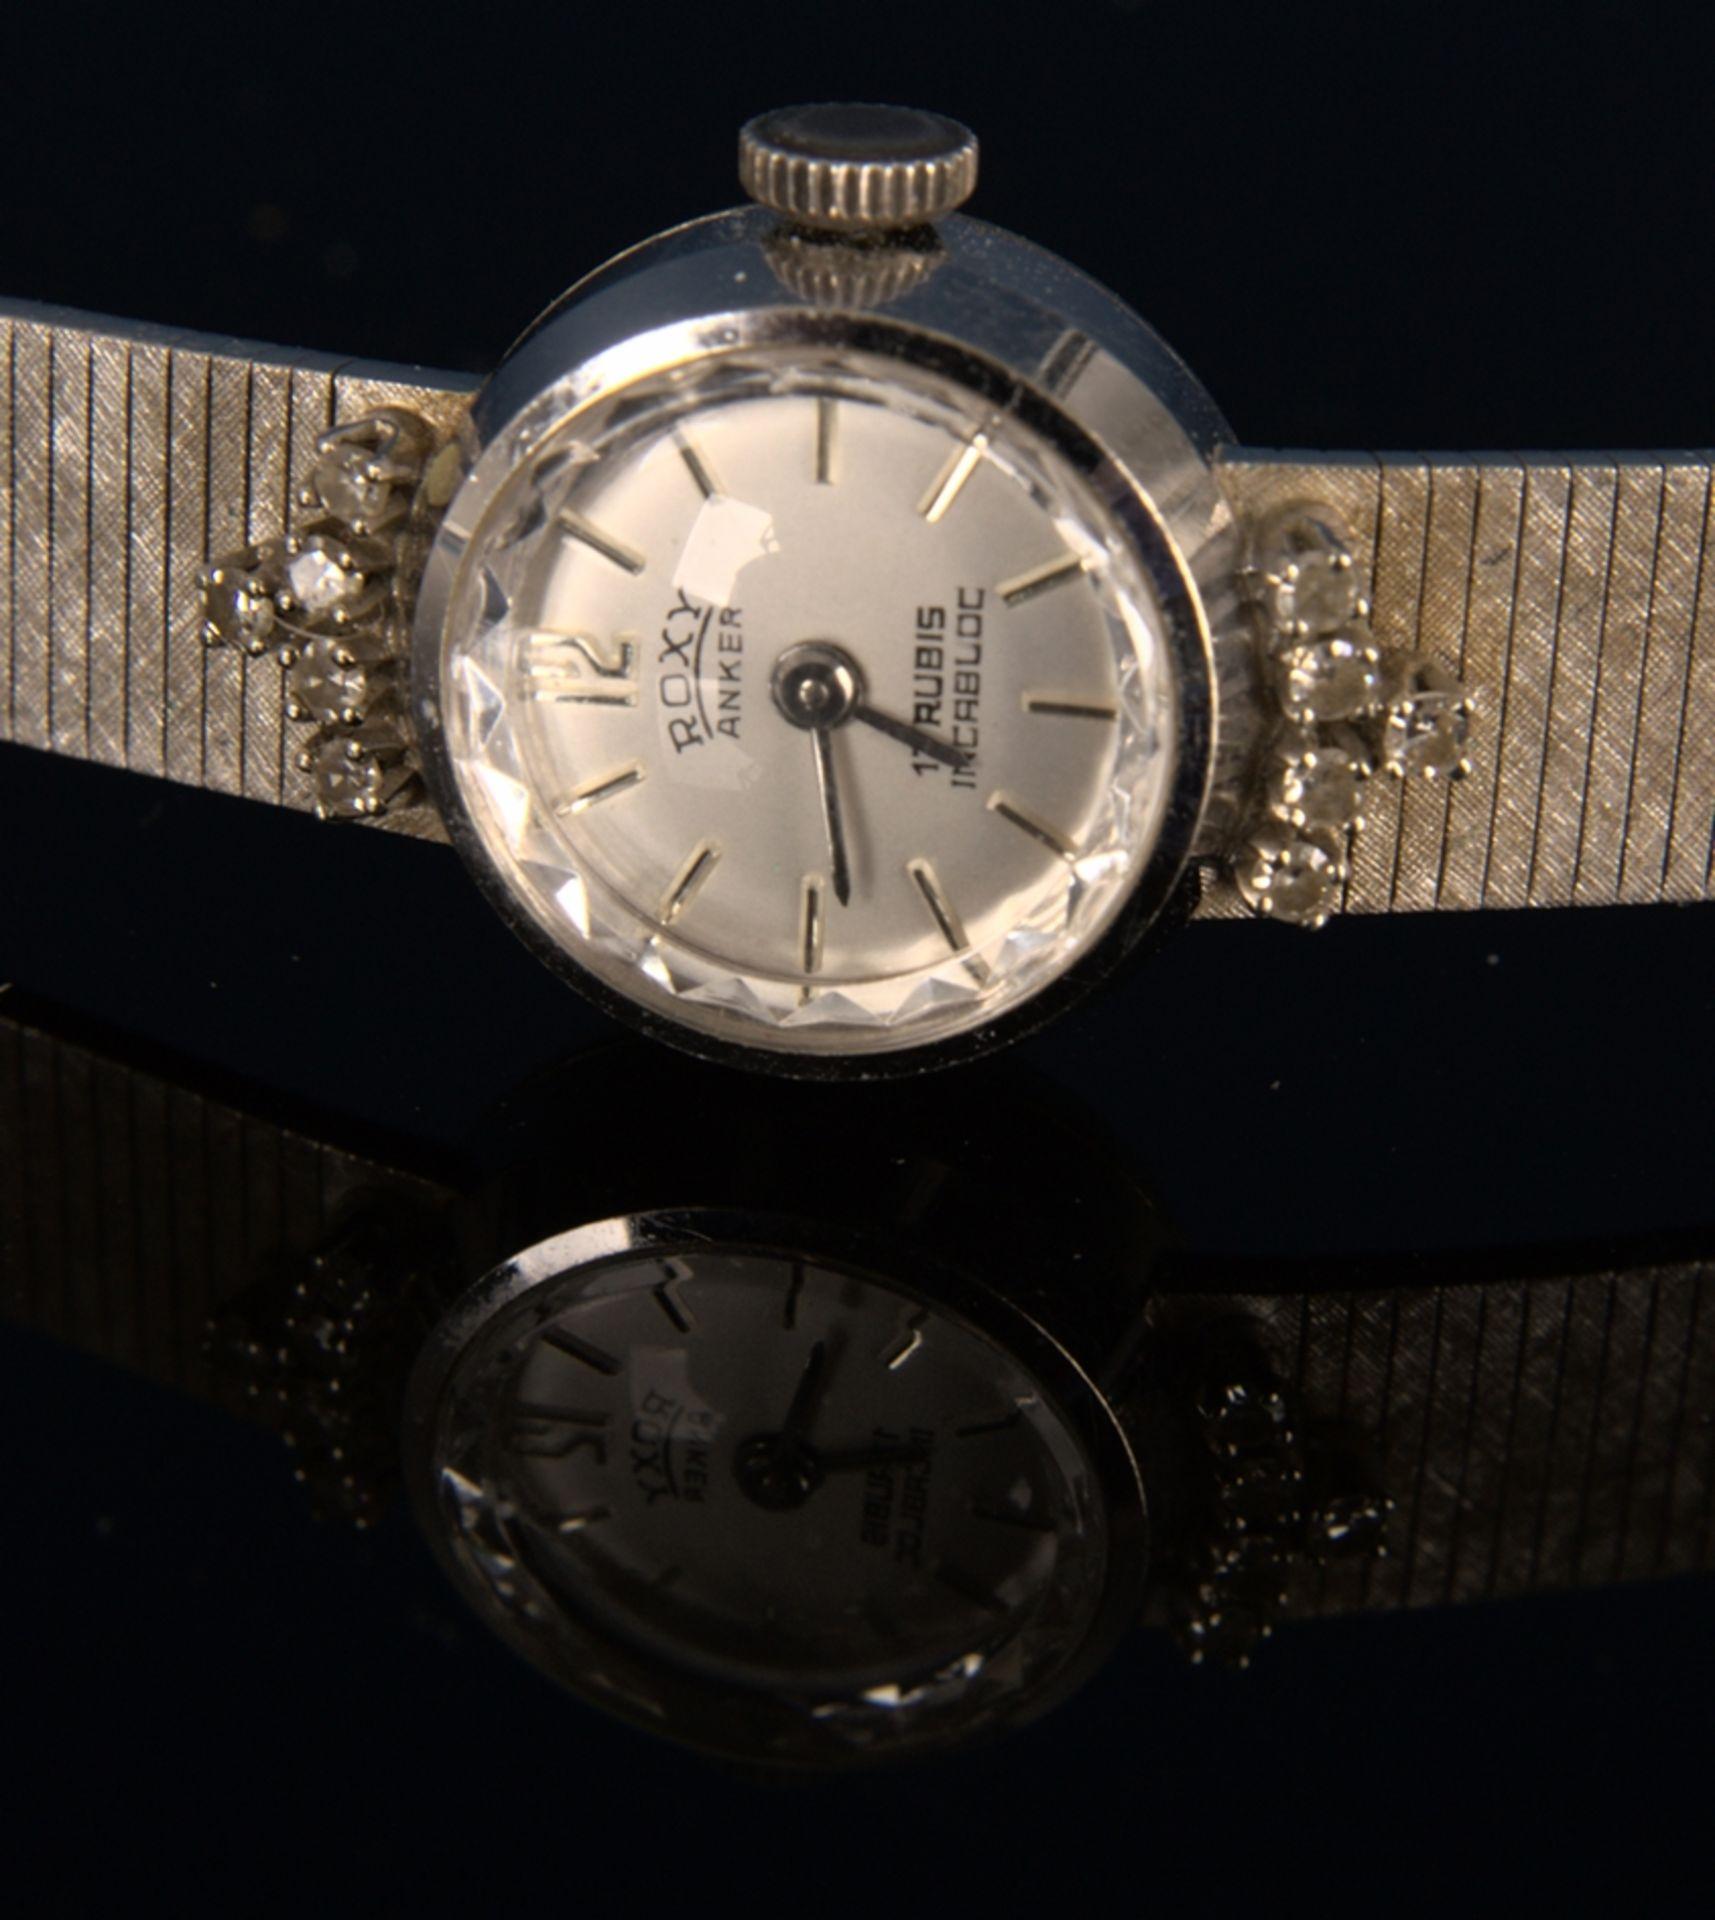 "Elegante COCKTAIL - Damenarmbanduhr der Marke ""ANKER - ROXY"" - 17 Rubis - Incabloc. Handaufzug, - Bild 4 aus 11"